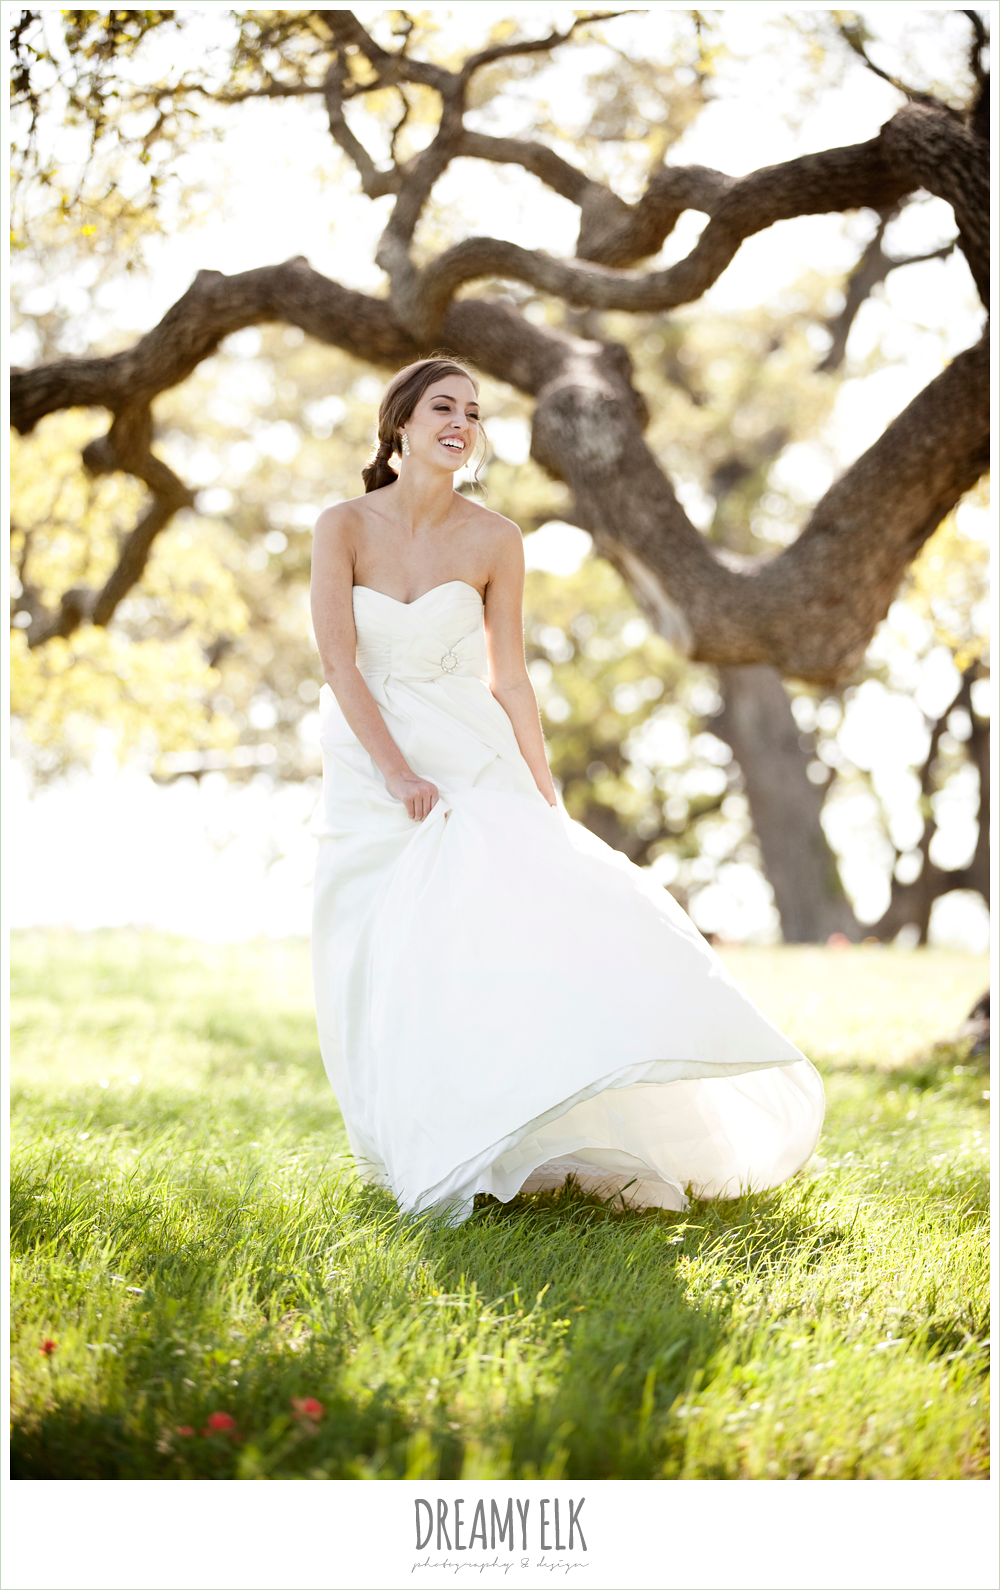 jessica, bridal photo contest, baylor university state park